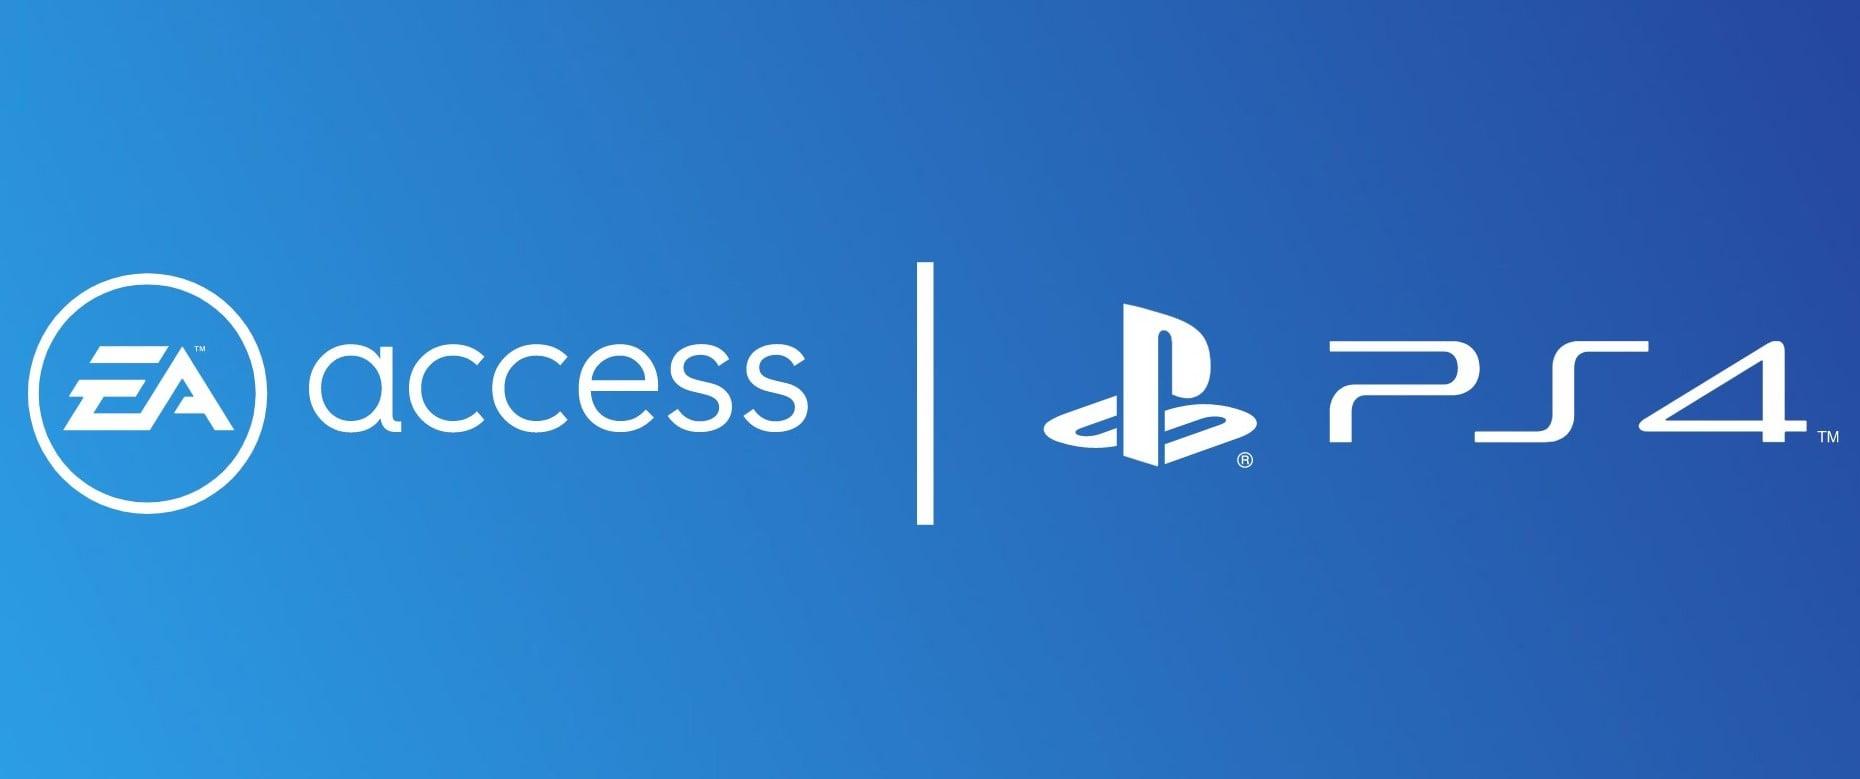 Kilka lat opóźnienia względem Xboksa - EA Access w końcu trafi na PlayStation 4